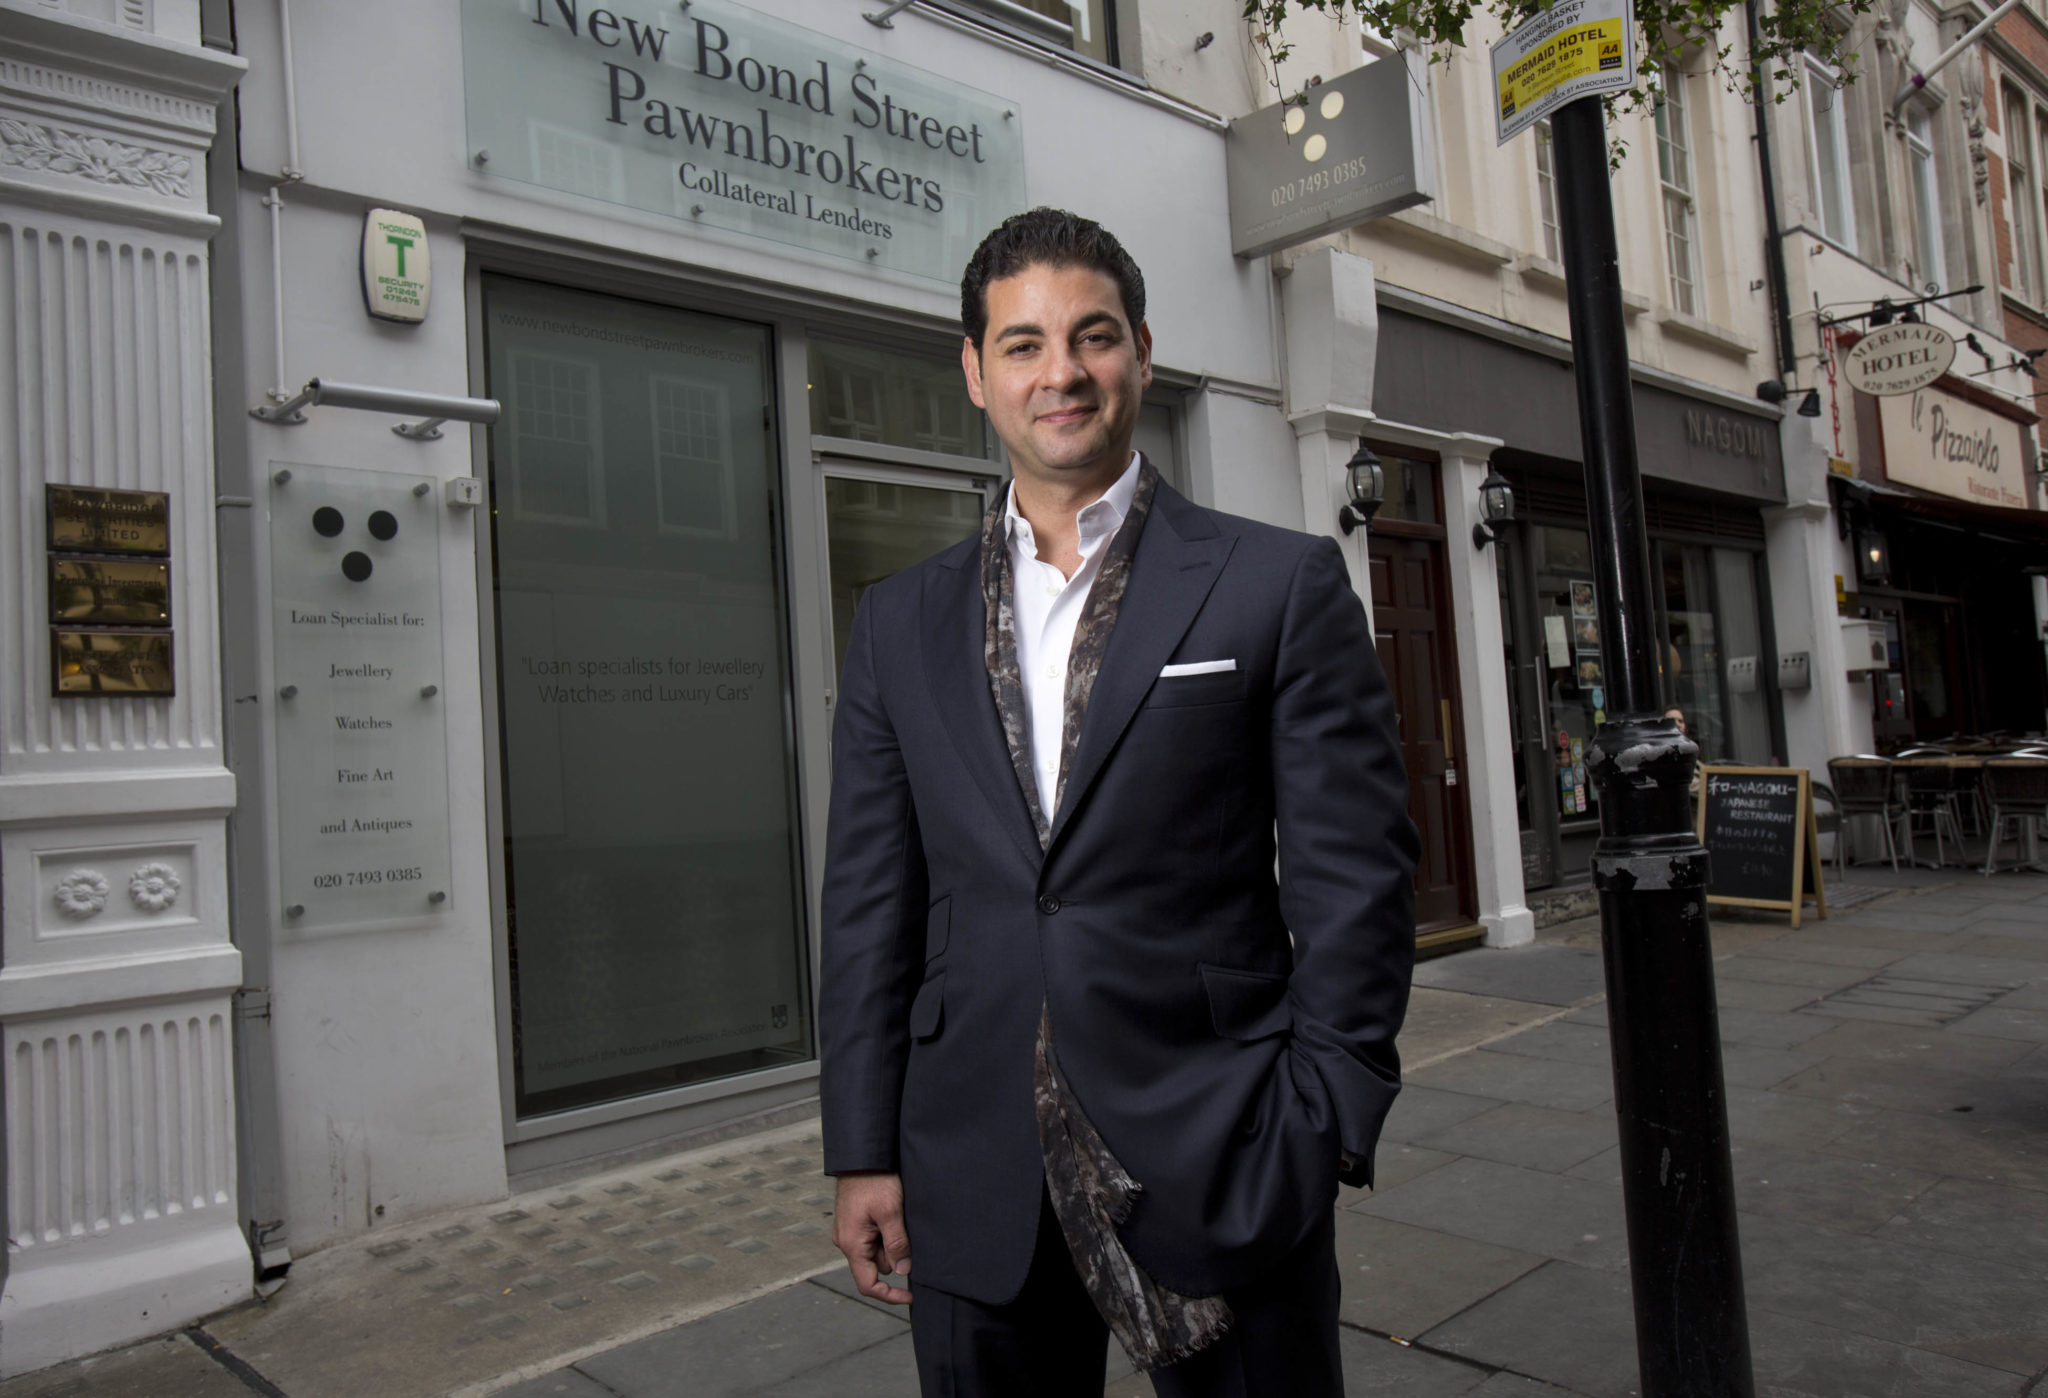 David Sonnenthal - Director Of New Bond Street Pawnbrokers, an elite London Pawnbroker having their main London pawn shop on Bond Street